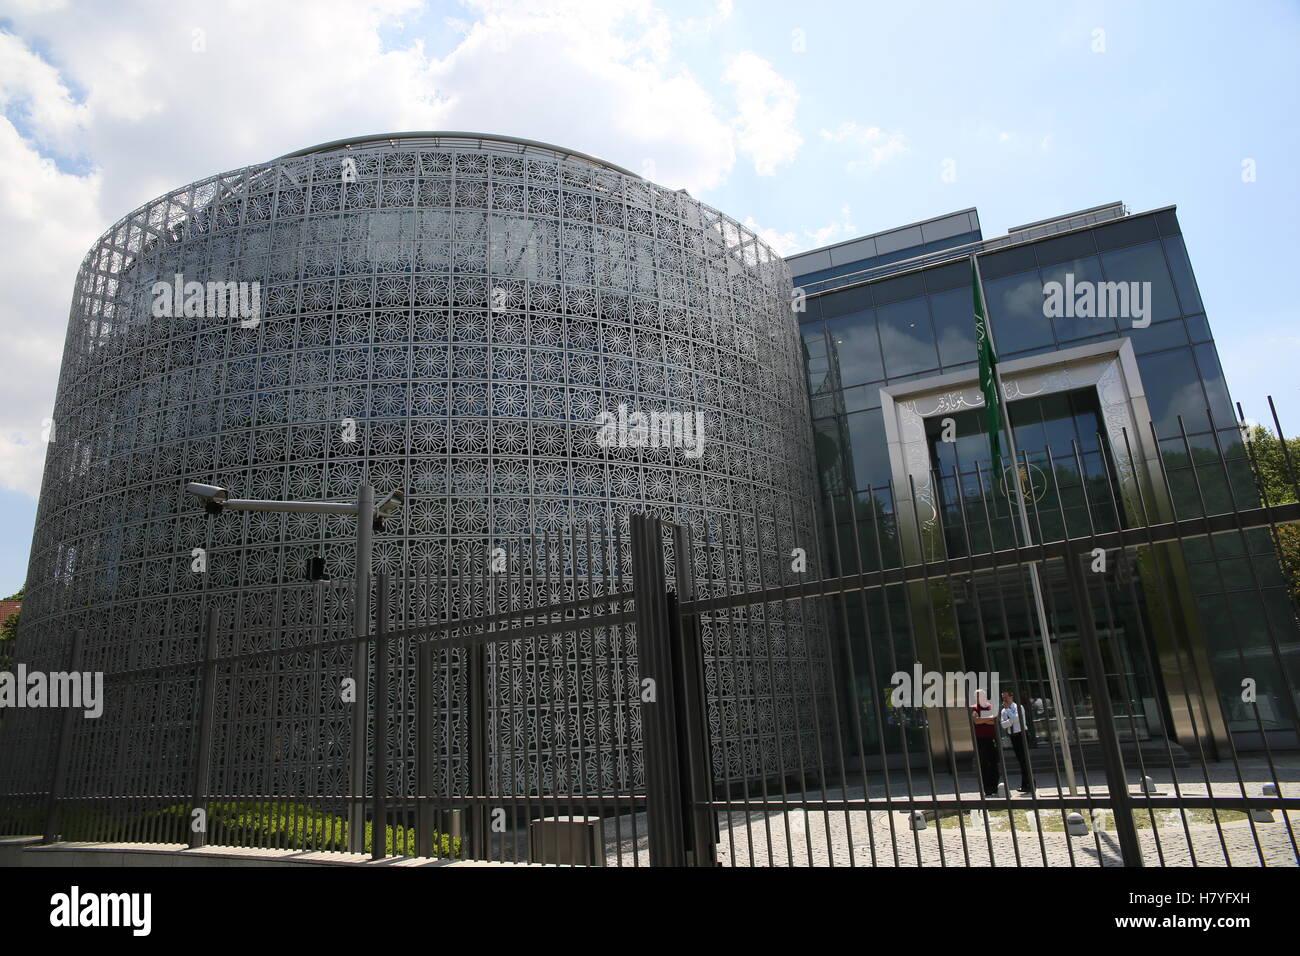 Amnesty International protested to free Raif Badawi at the Saudi-Arabian Embassy, May, 22nd 2015 in Berlin Germany. - Stock Image